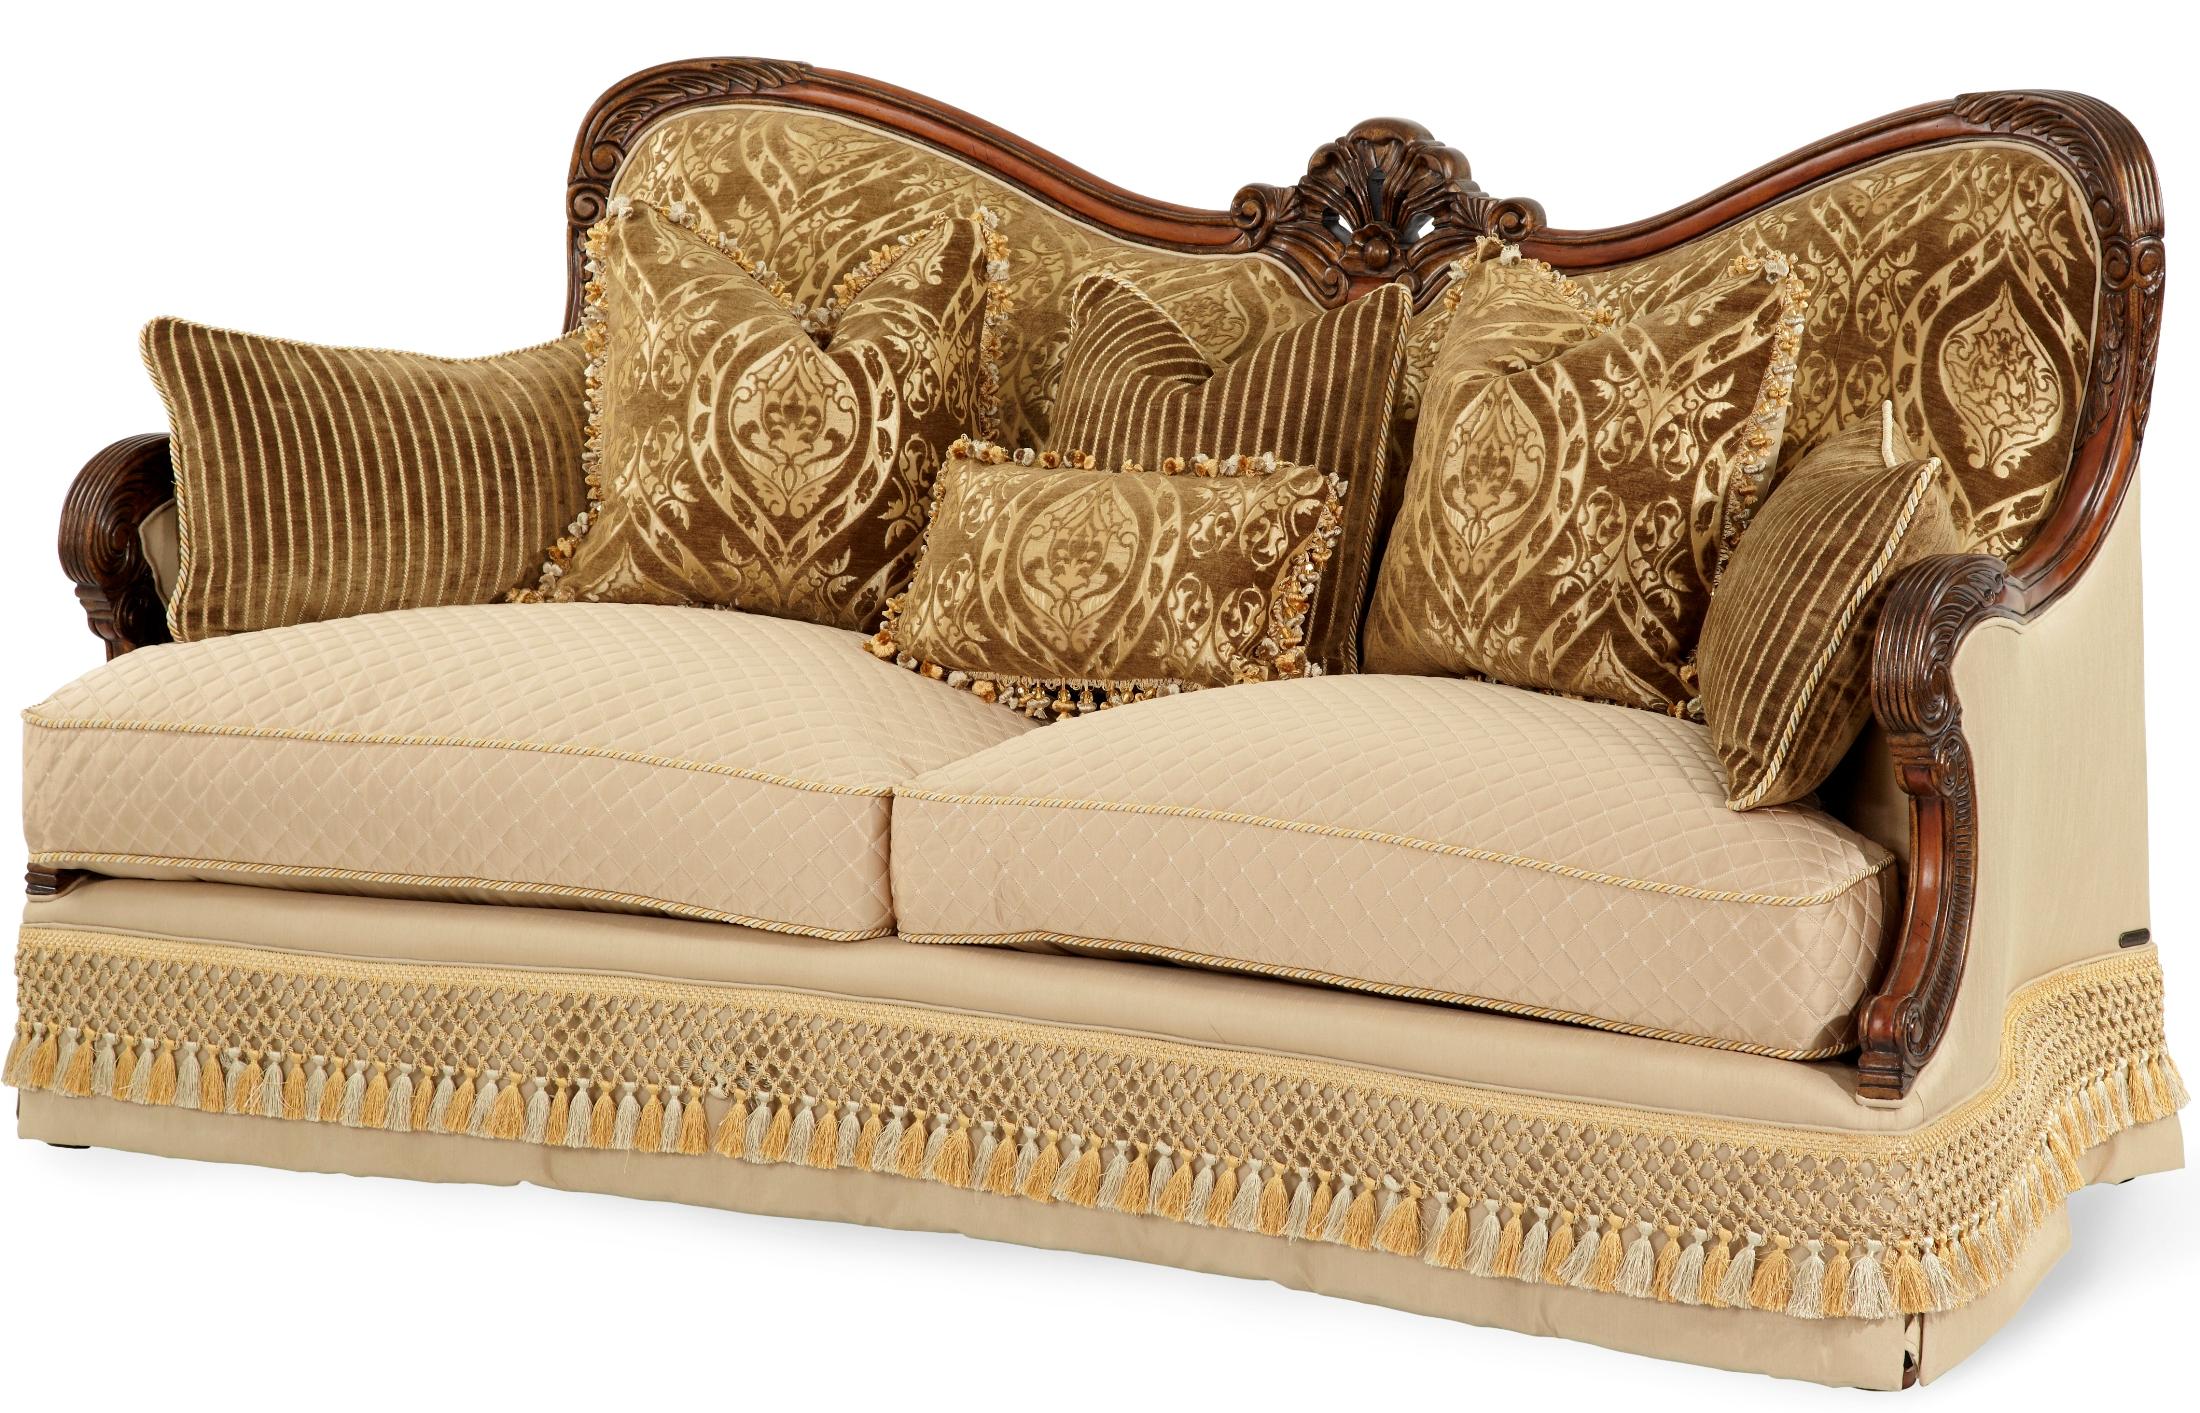 Aico chateau beauvais wood trim sofa chateau beauvais - Chateau beauvais living room furniture ...